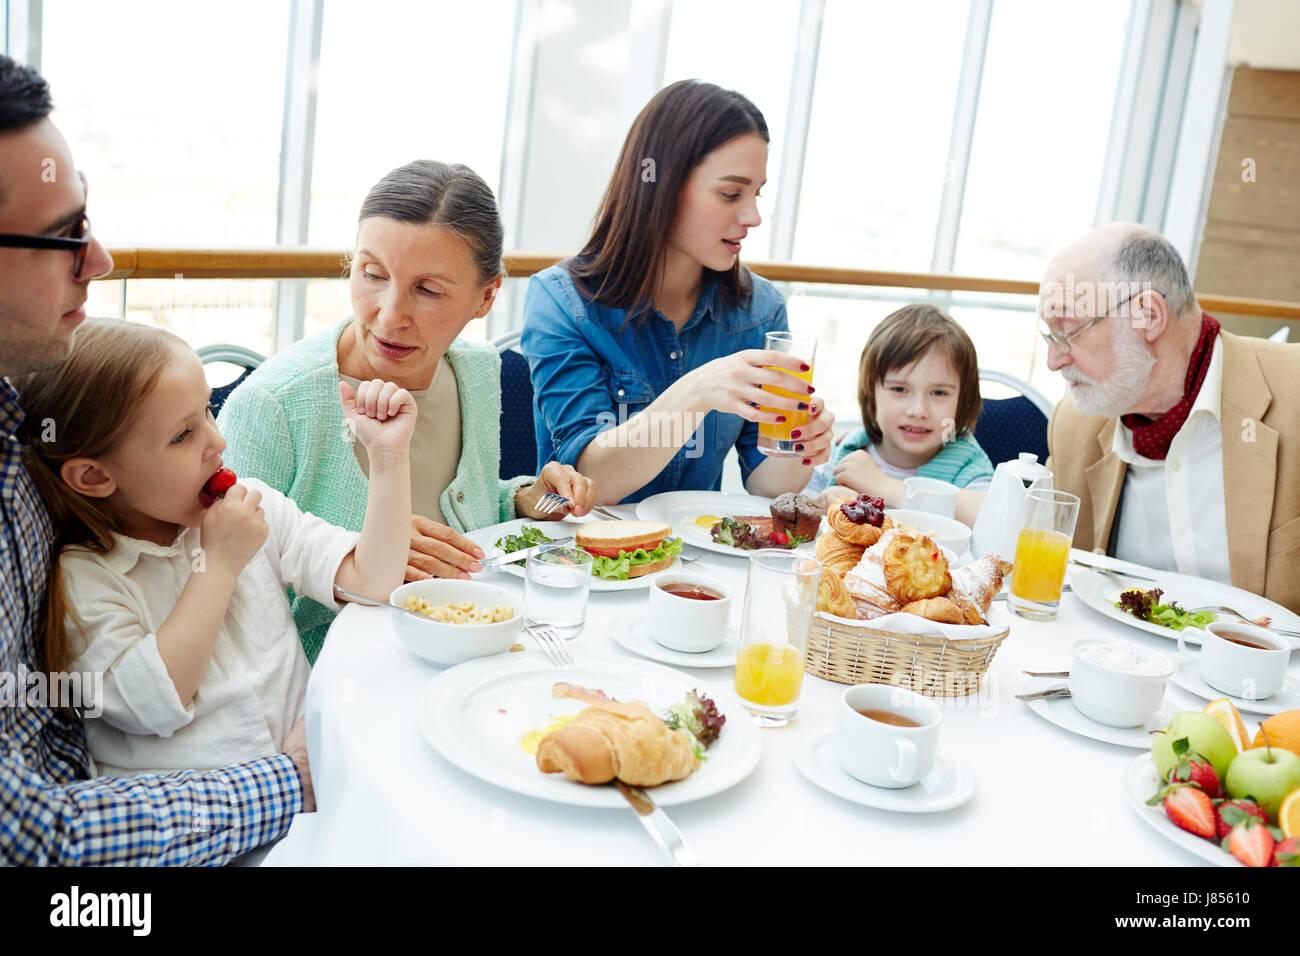 Big family of three generations having breakfast in restaurant - Stock Image